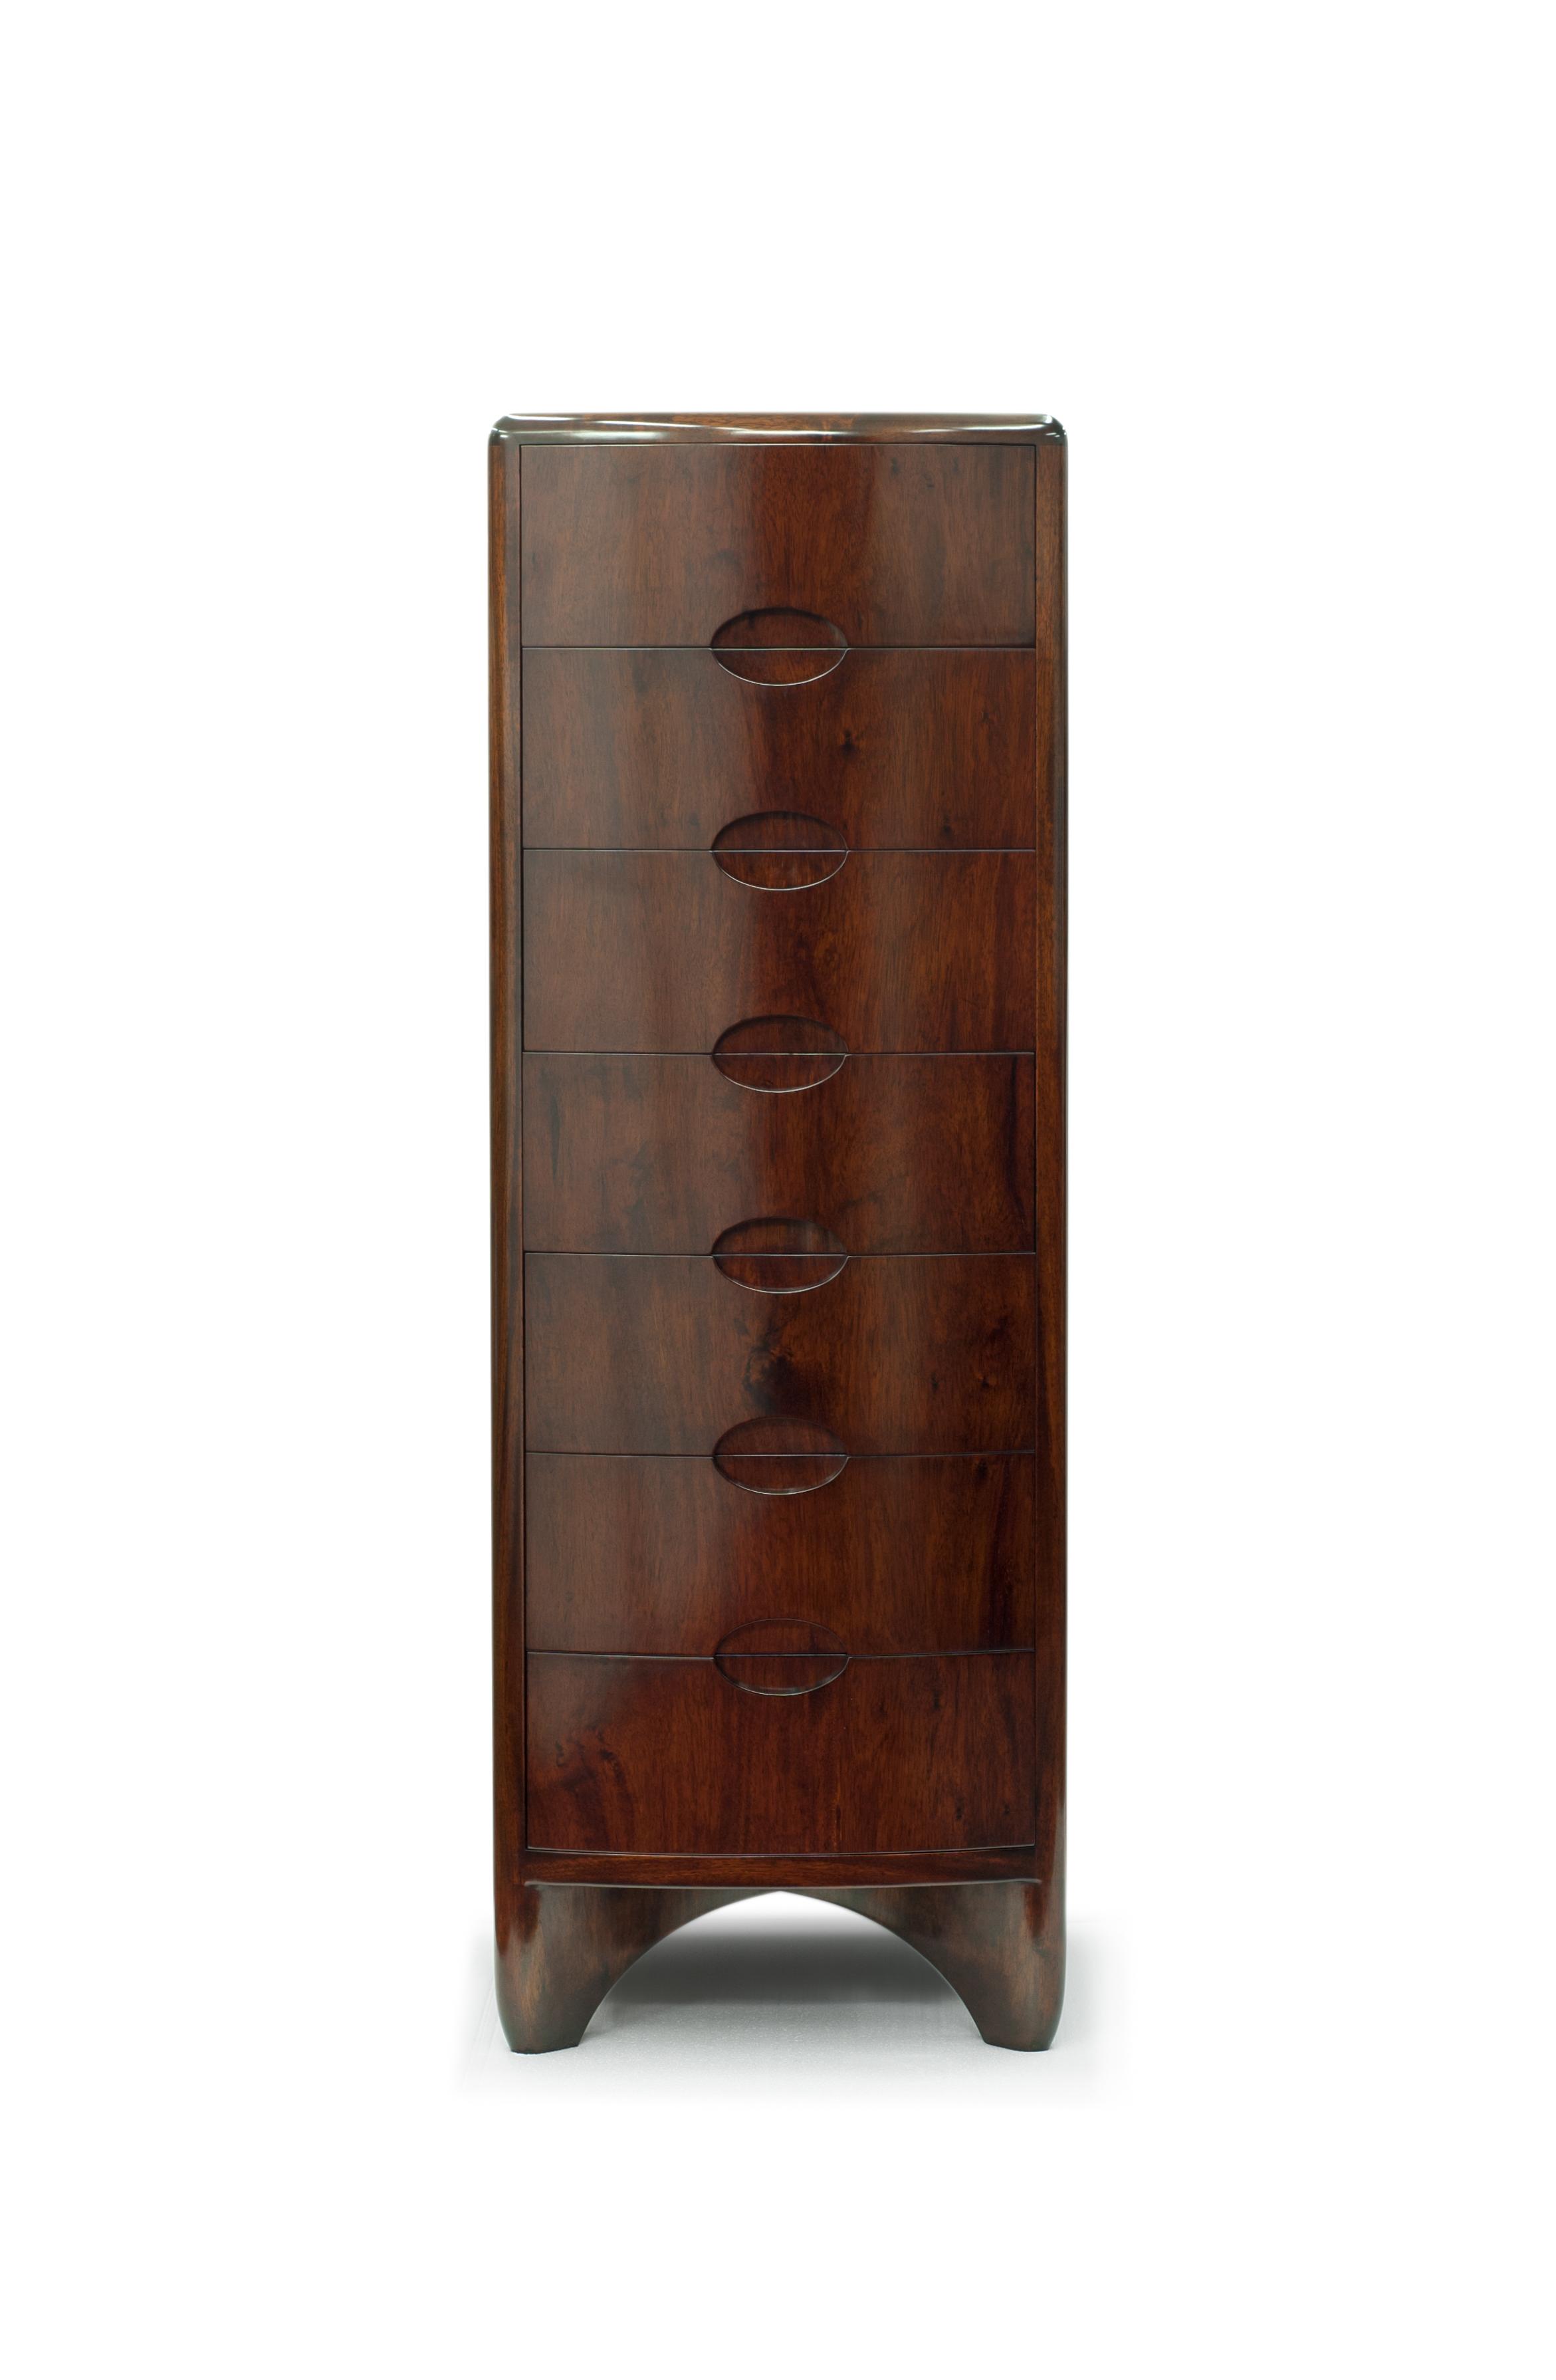 ....bespoke furniture : tall chest ..特别定制家具 : 高抽屉柜....